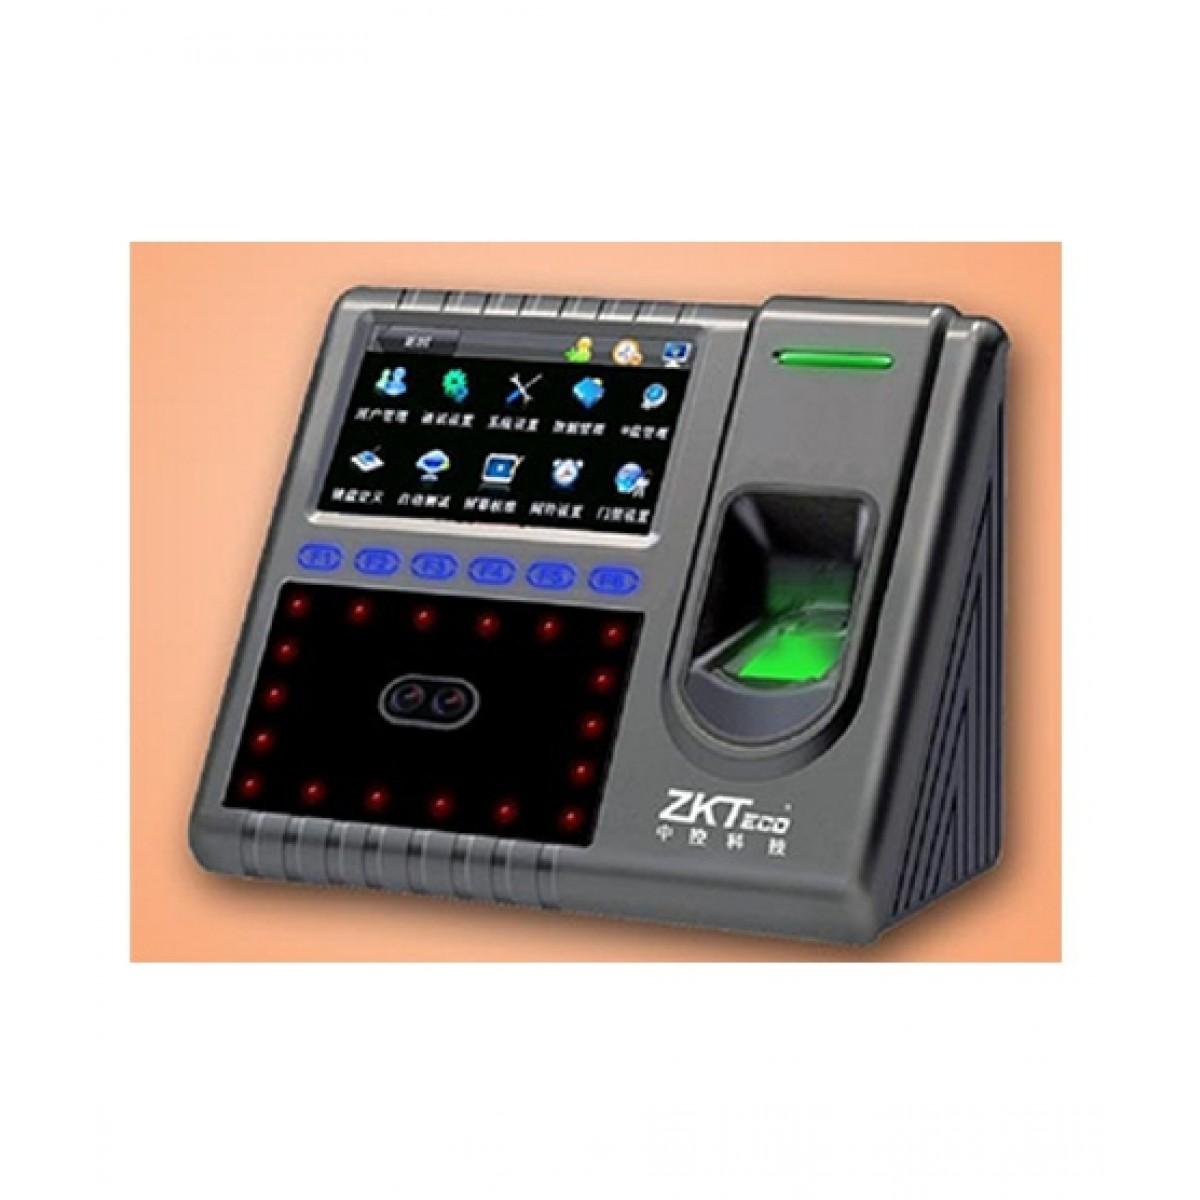 ZKteco iFace502 Multi-biometric Identification Attendance And Access Control Terminal